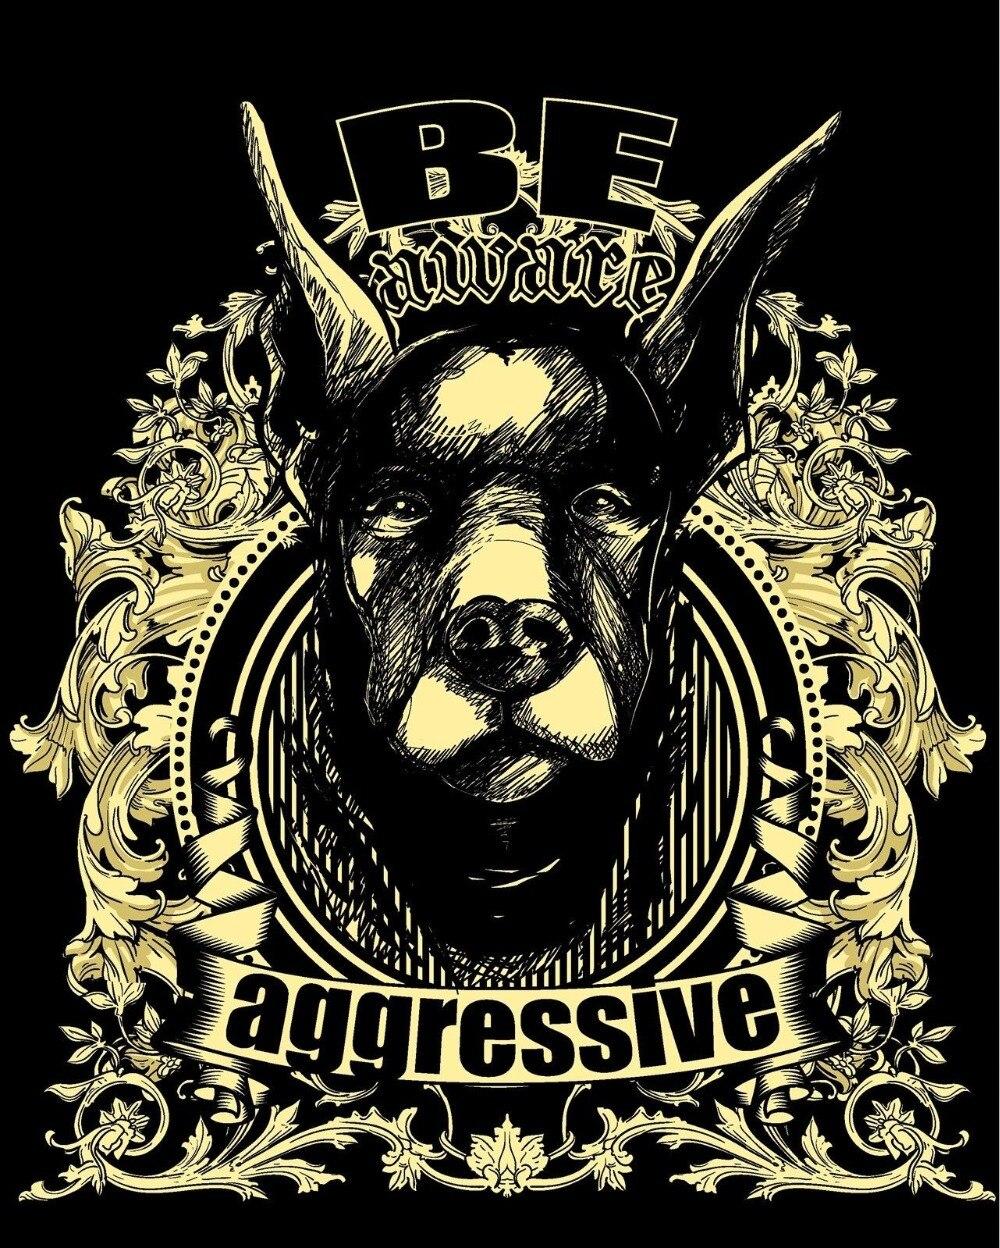 2018 Short Sleeve Cotton T Shirts Man Clothing Black Tee Shirt Be Aggressive Dog 371Funny Clothing Casual Short Sleeve Tshirts